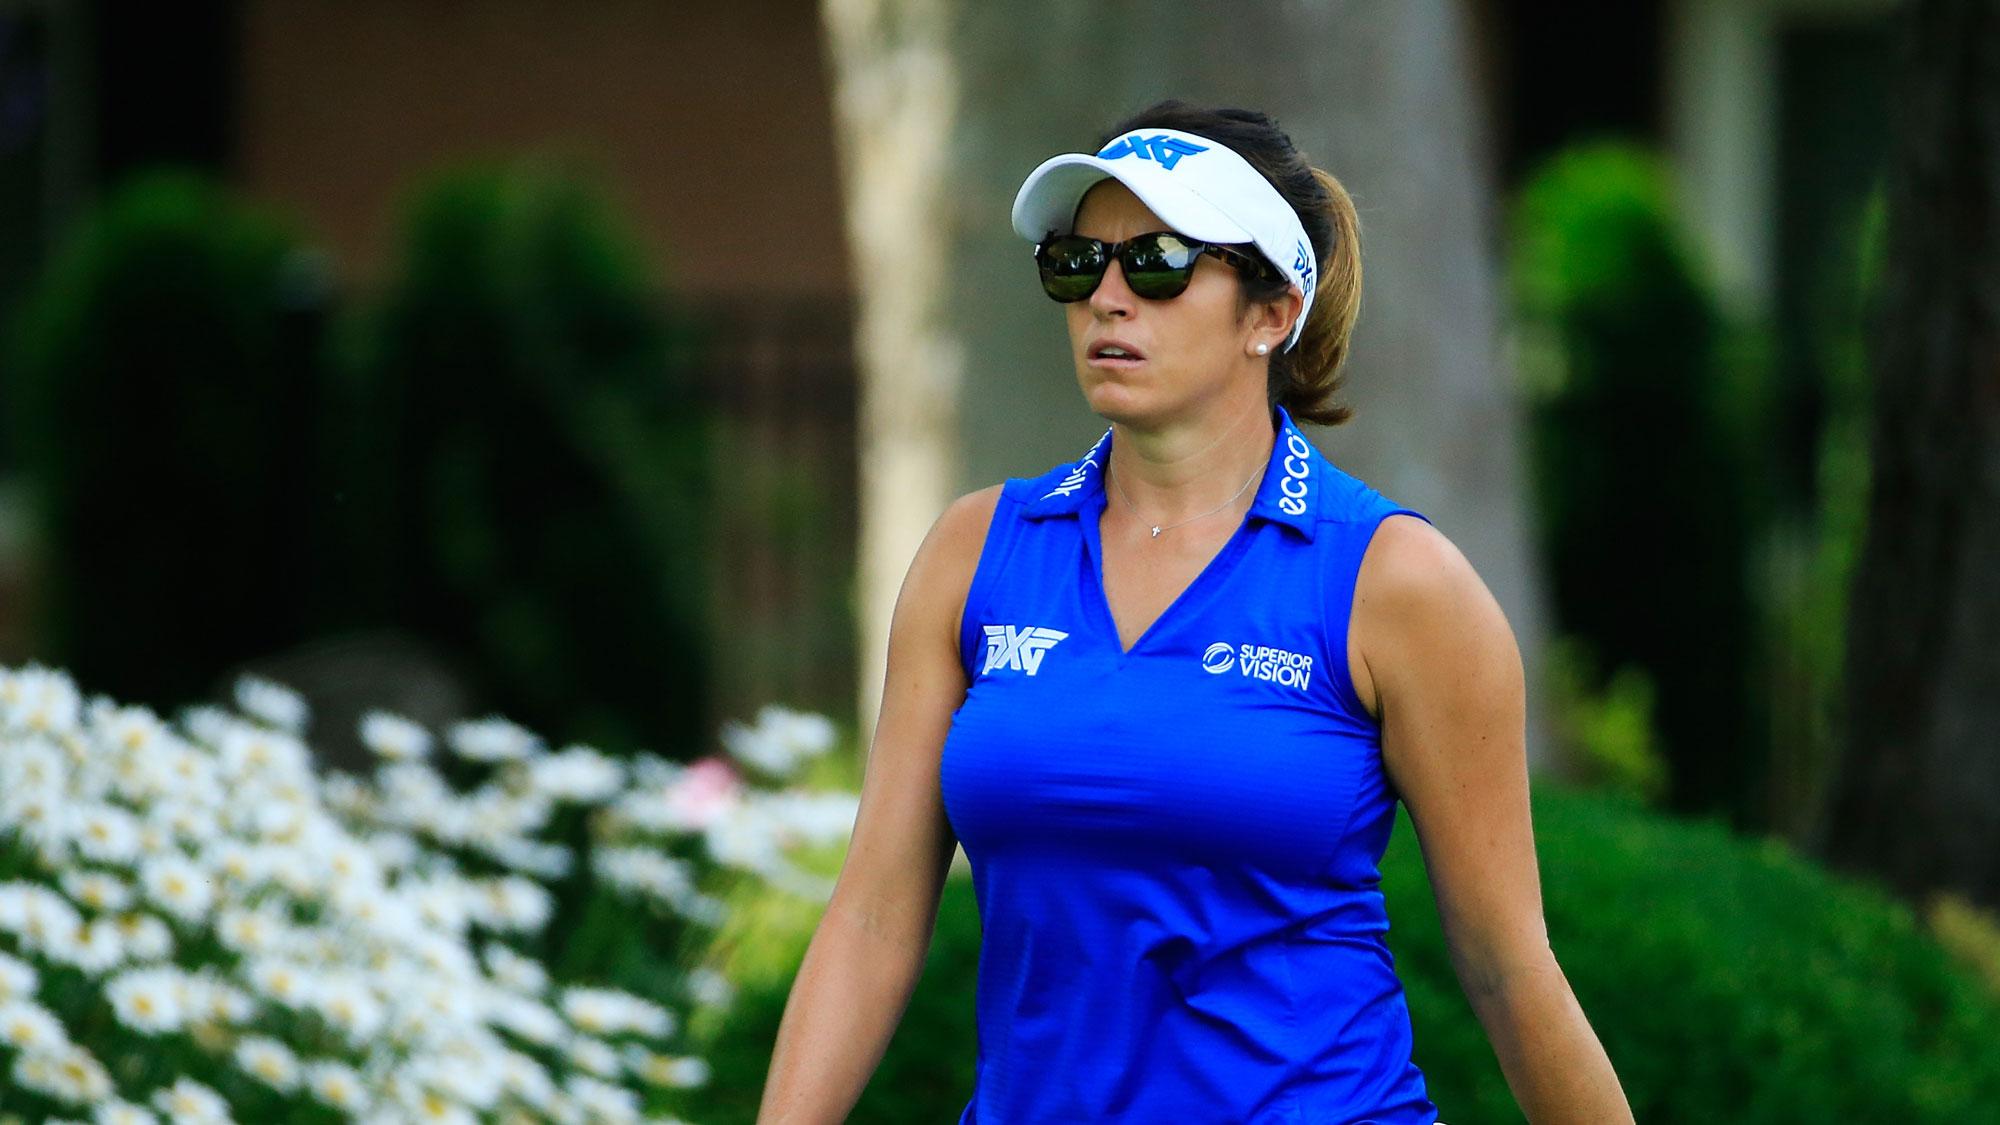 lpga.com - Gerina Piller Holds 36-Hole Lead in Toledo | LPGA